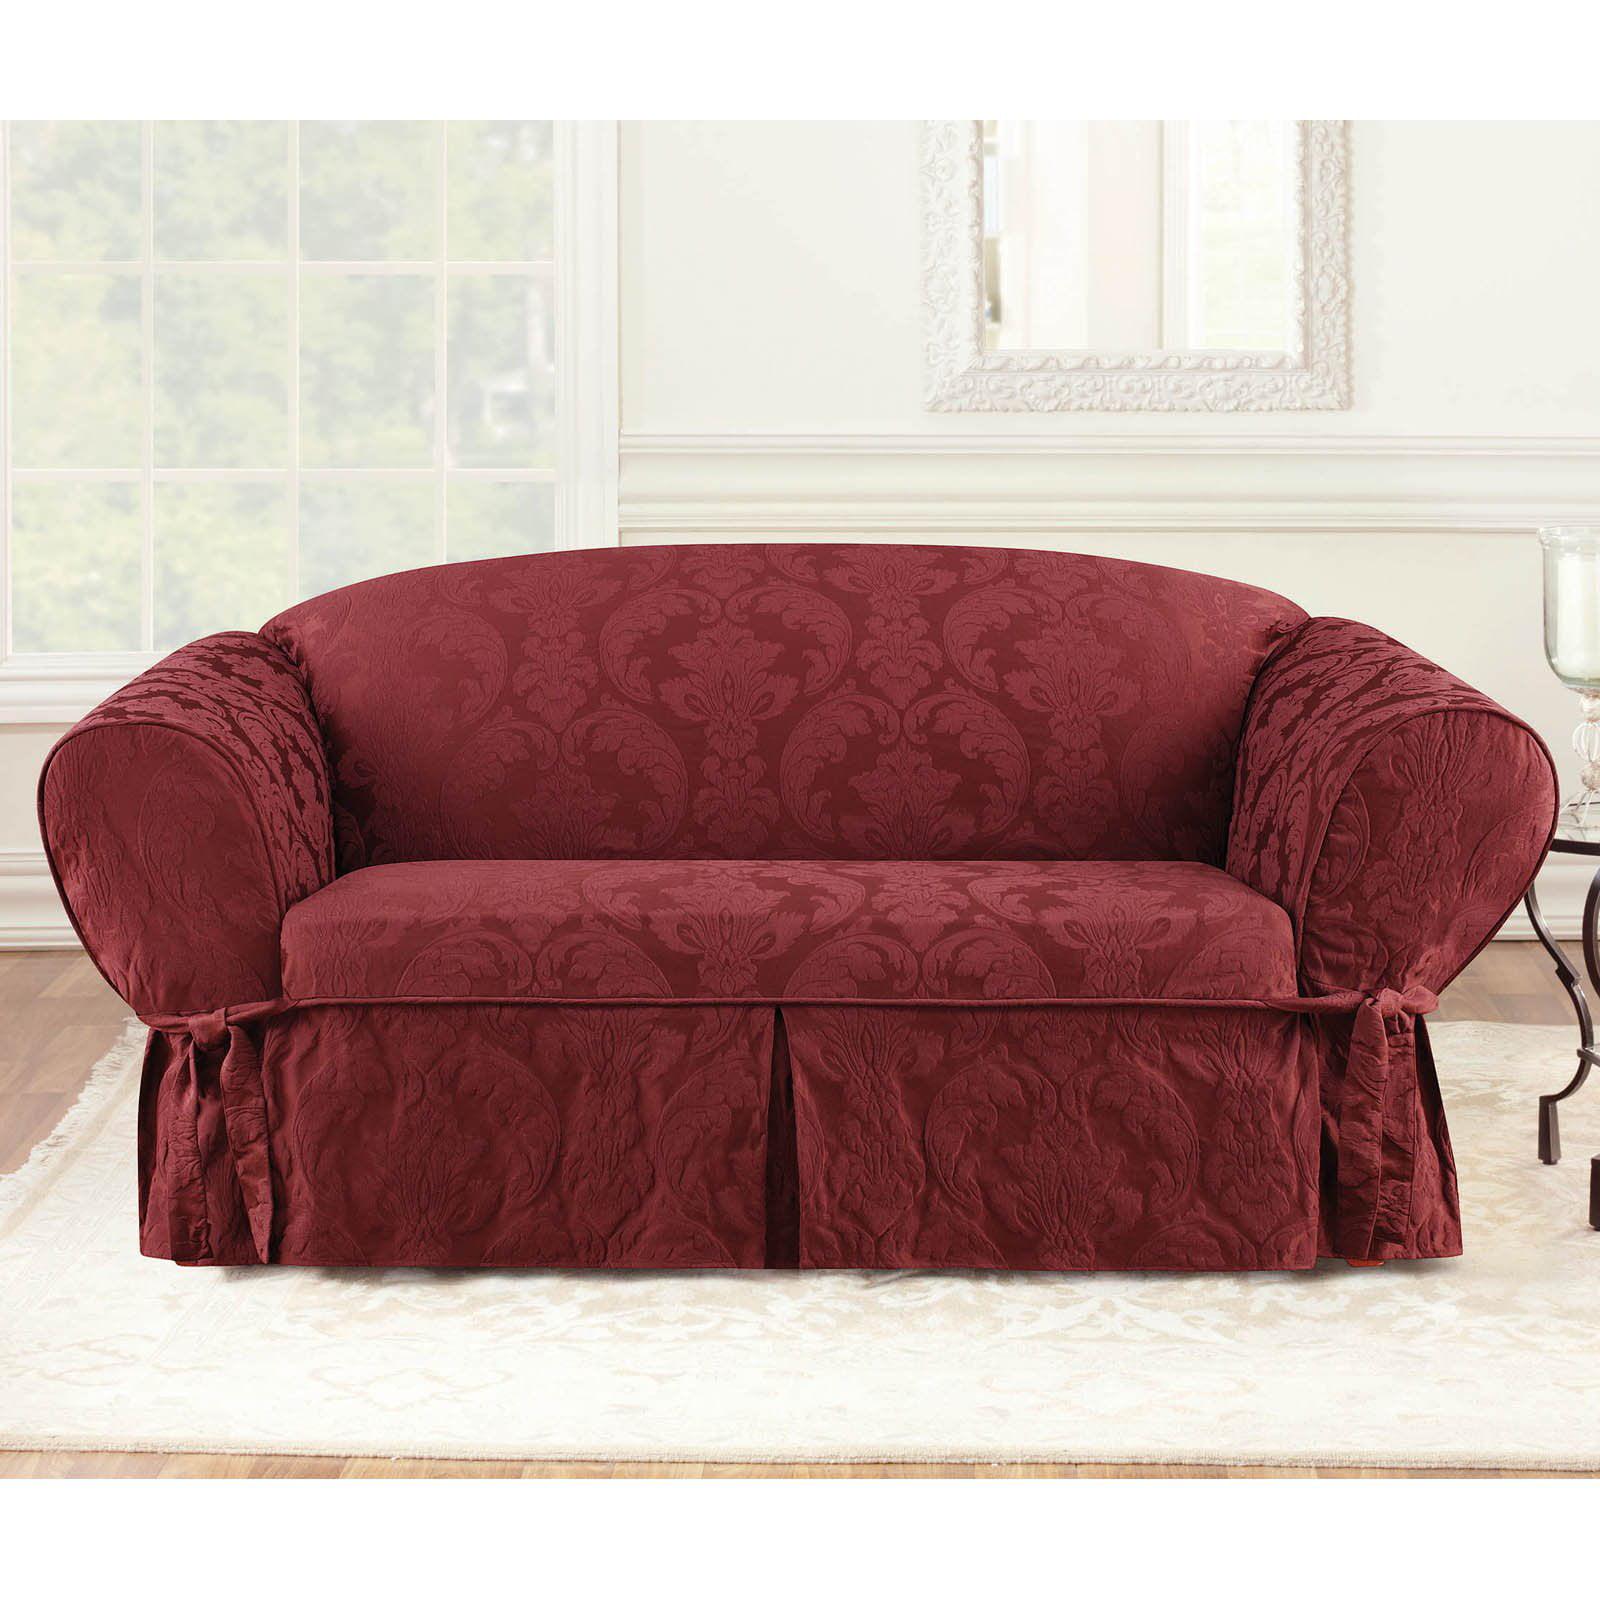 Pleasant Sure Fit Matelasse Damask Sofa Slipcover Theyellowbook Wood Chair Design Ideas Theyellowbookinfo